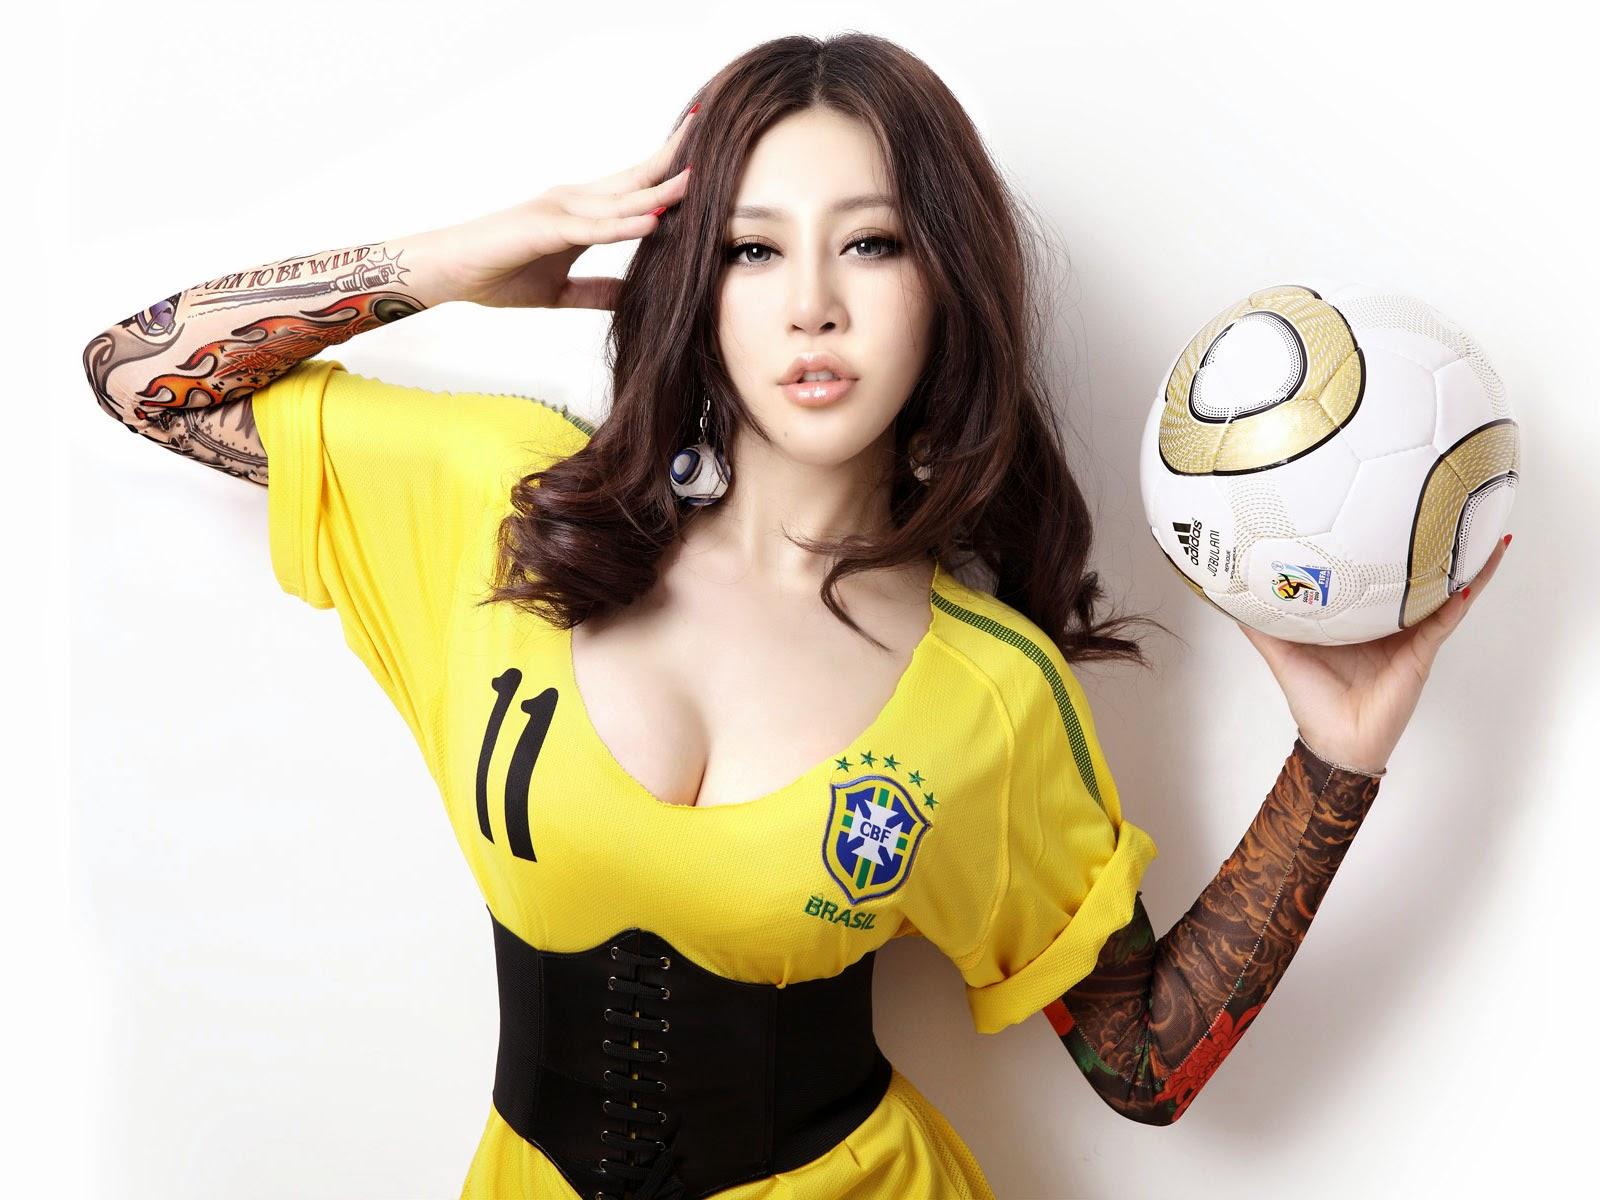 Mesut Ozil Wallpapers Hd Arsenal Download Sexy Soccer Wallpapers 1 Hd Wallpaper